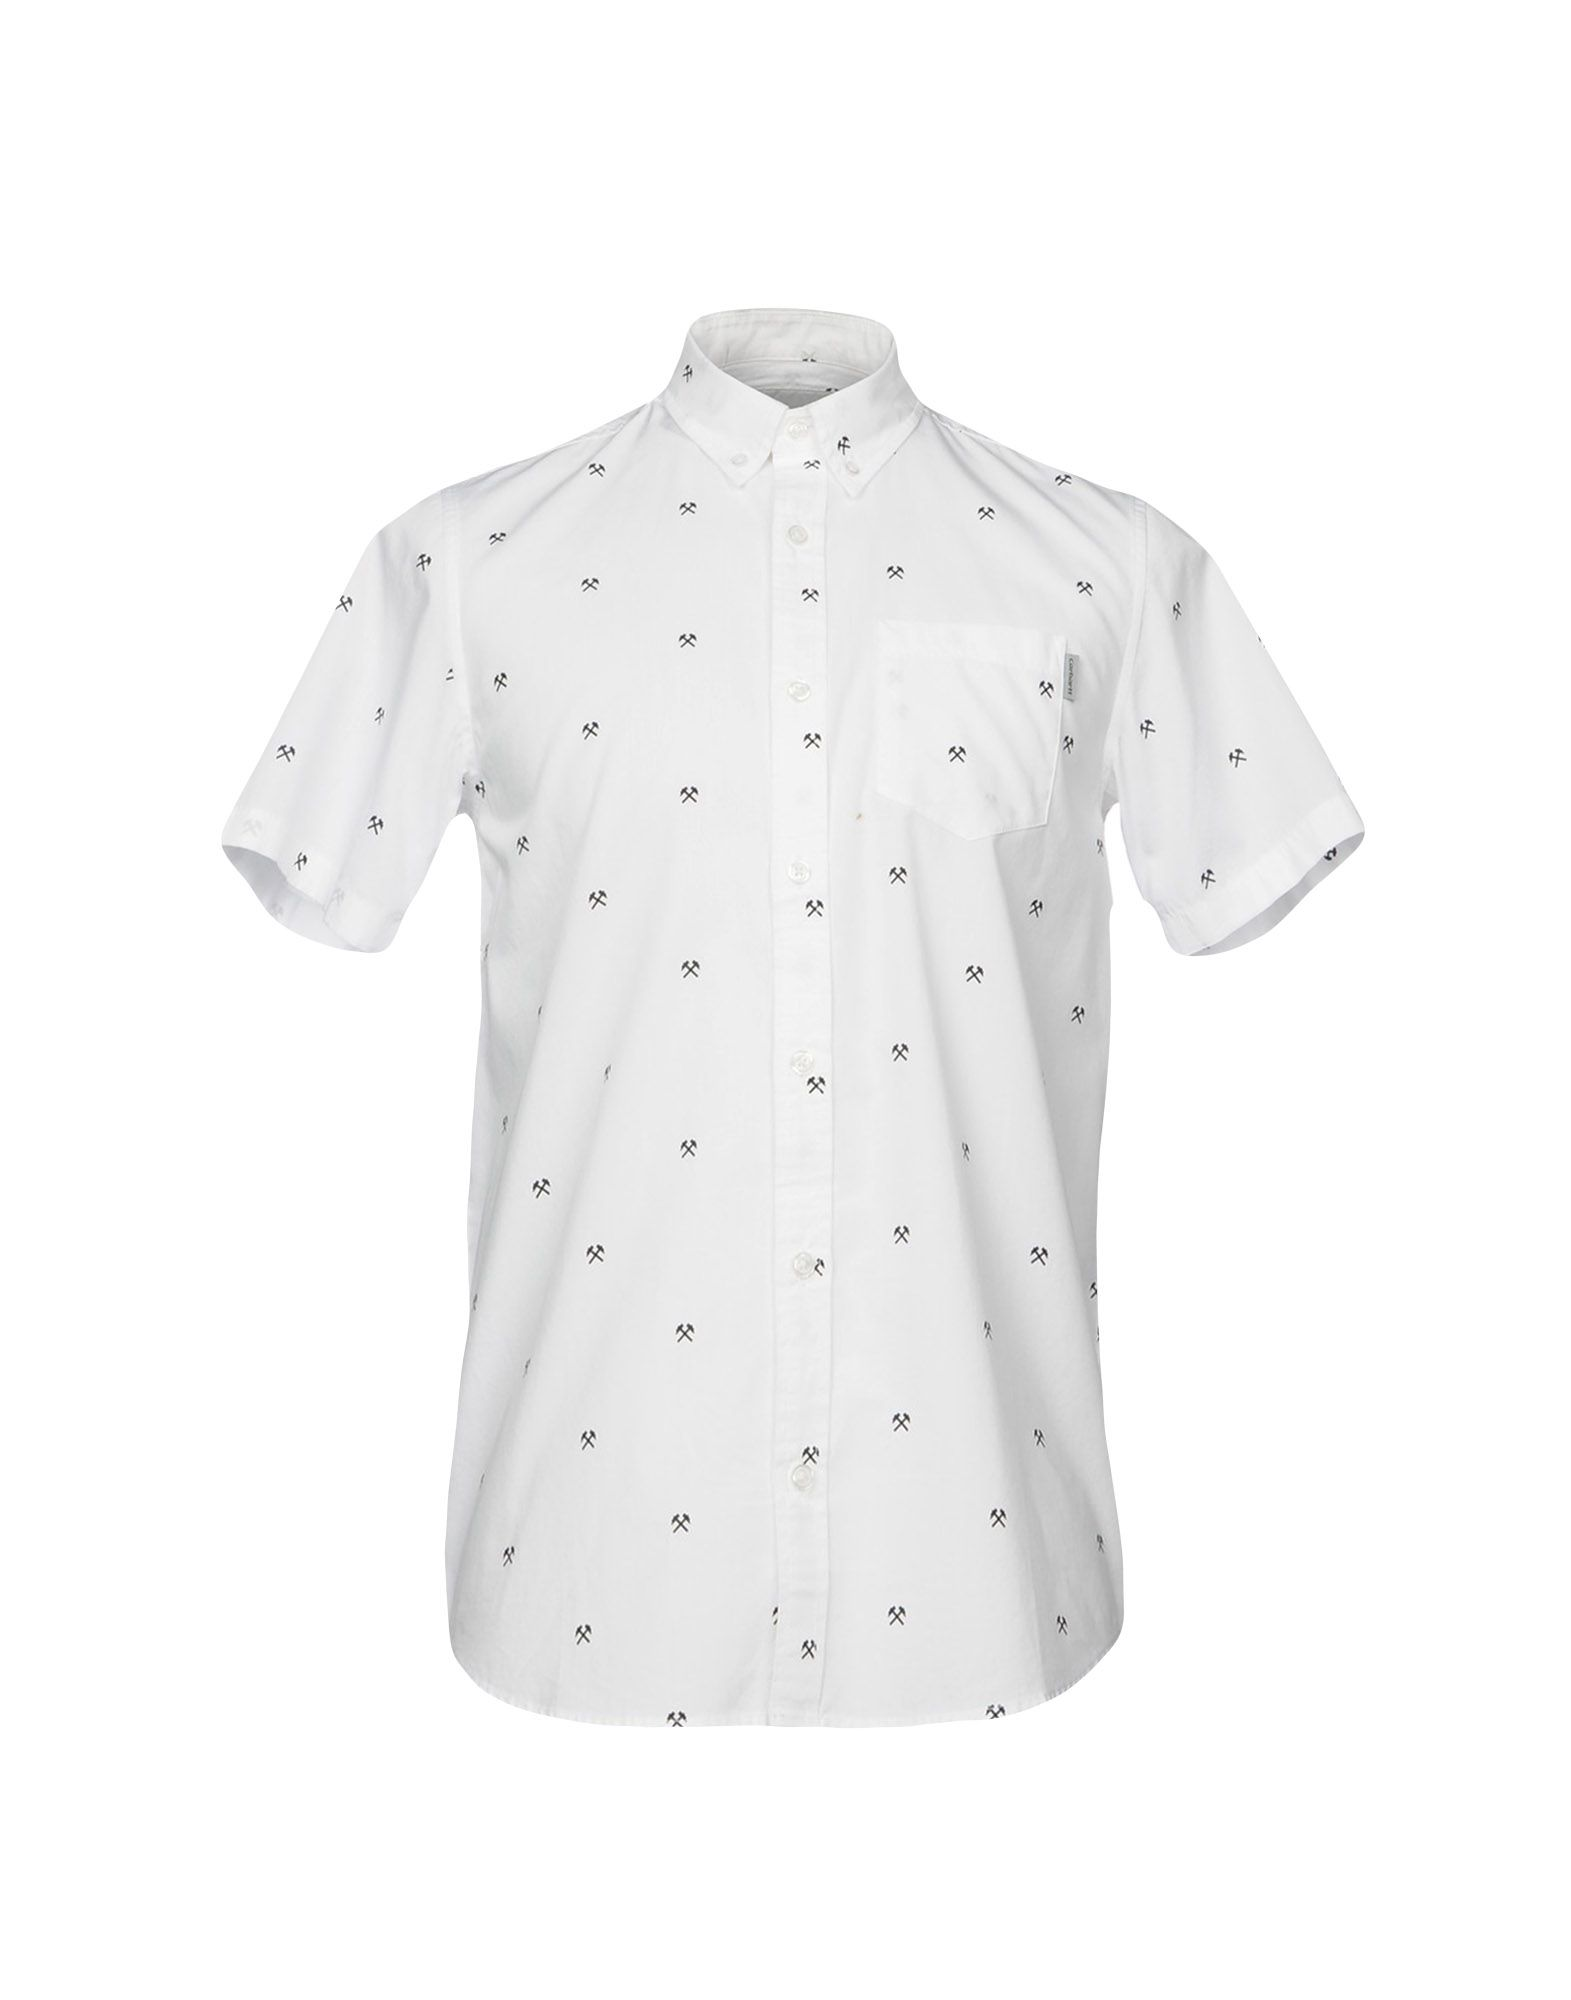 CARHARTT Pубашка delusion pубашка